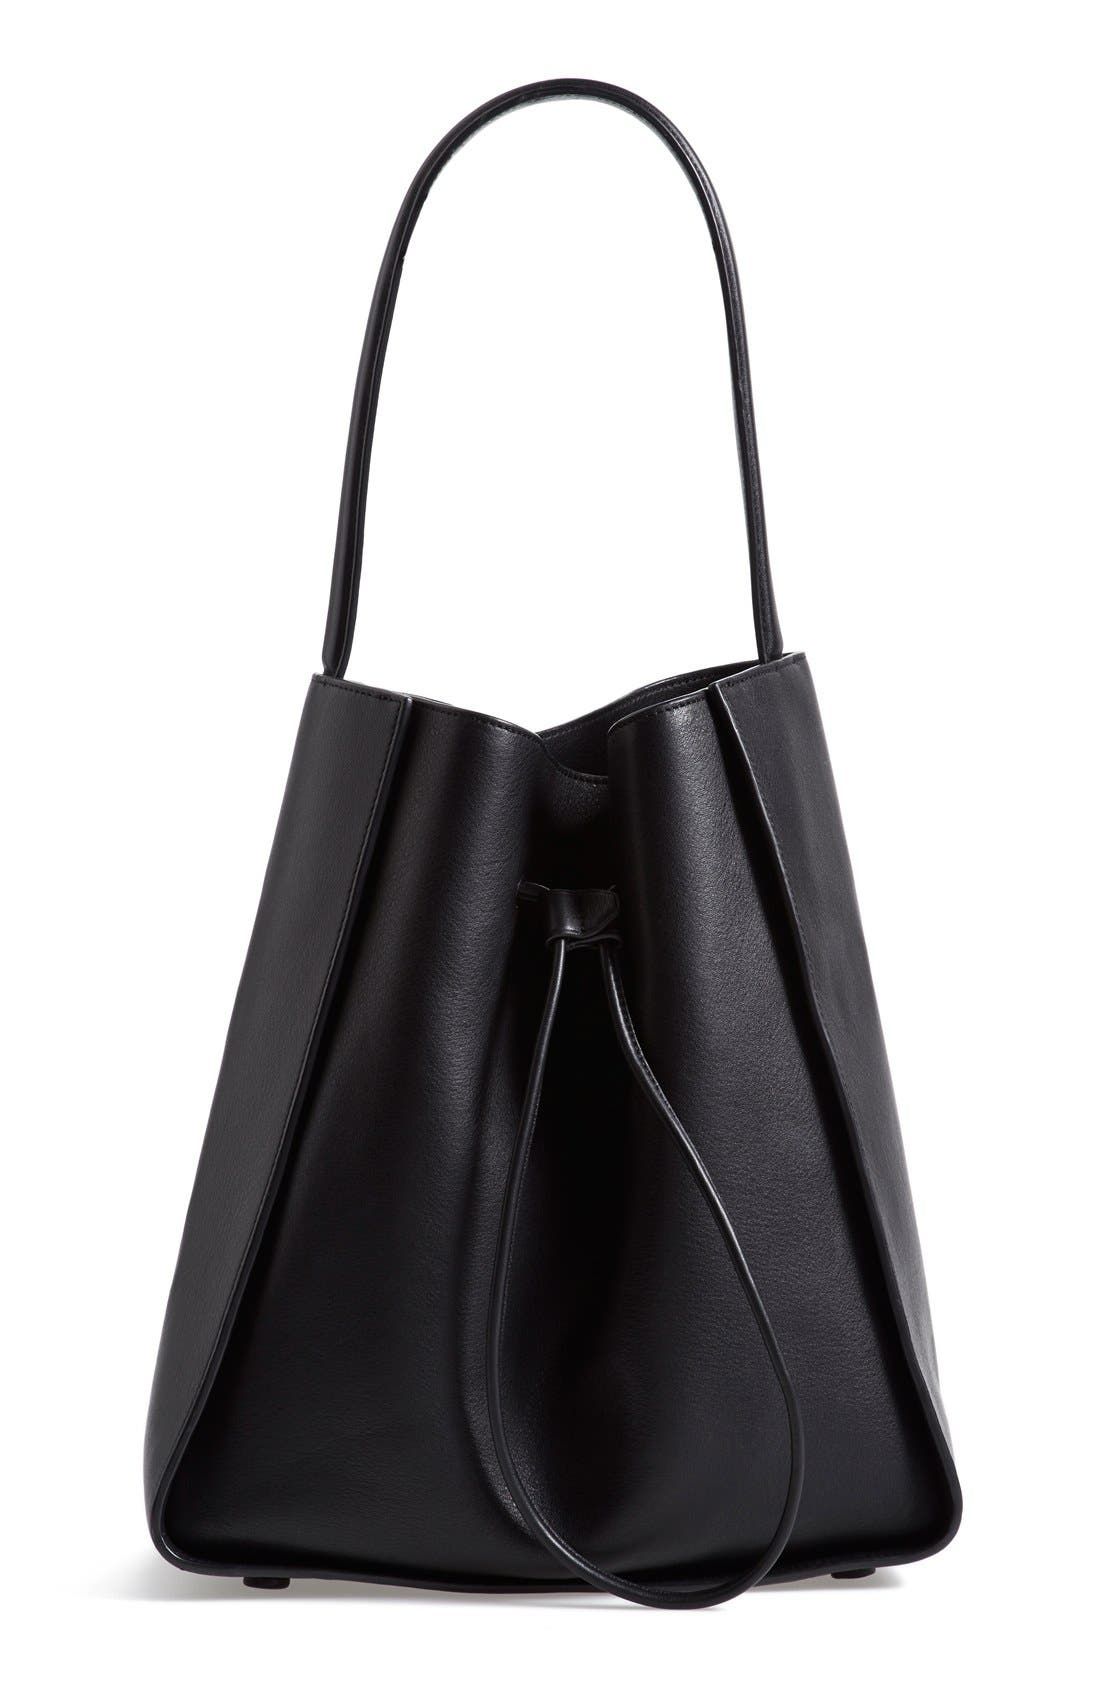 3.1 PHILLIP LIM 'Large Soleil' Leather Bucket Bag, Main, color, 001